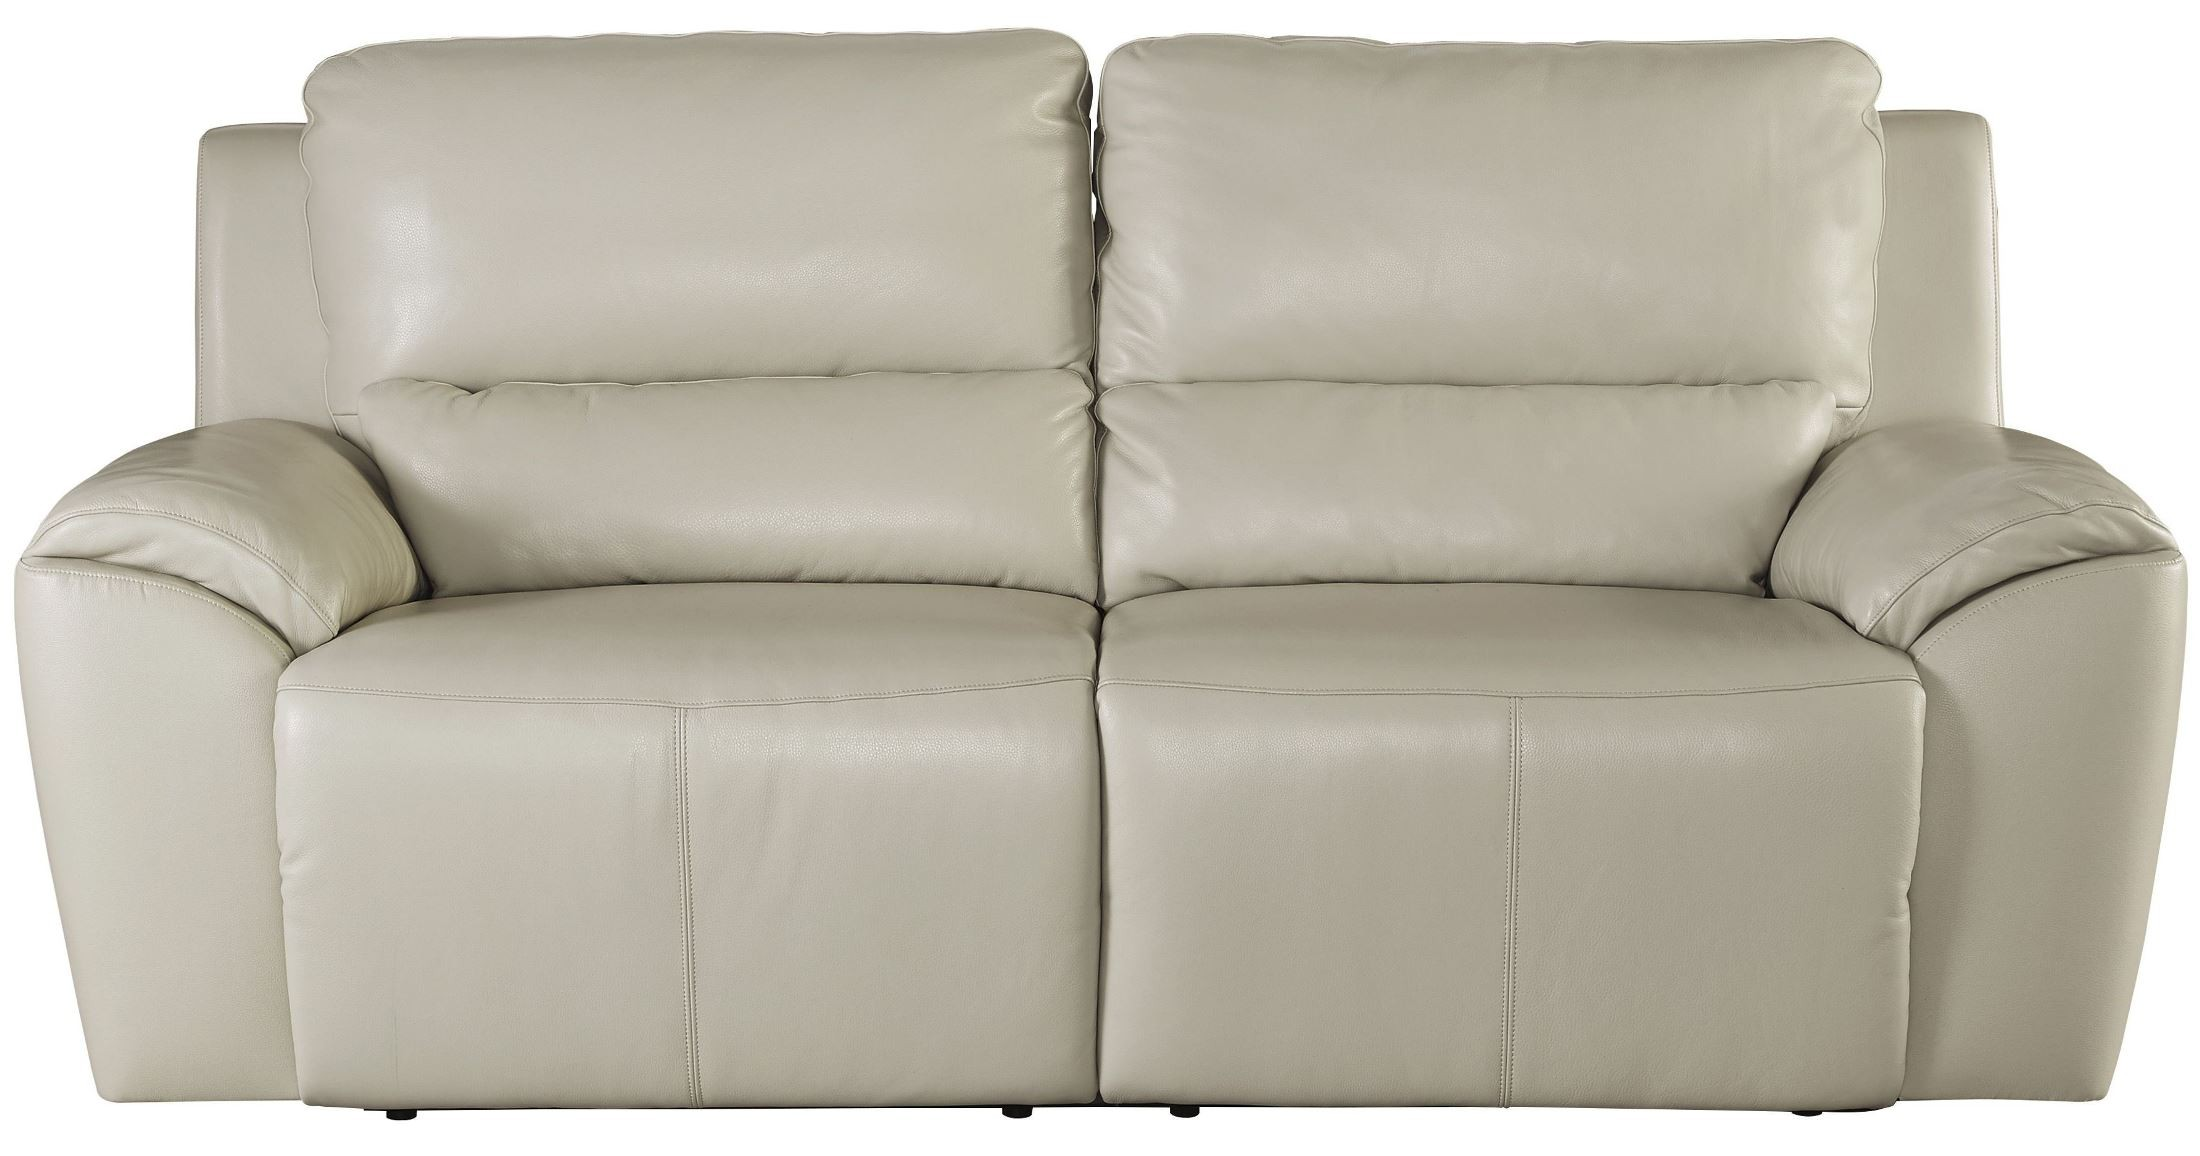 Valeton Cream 2 Seat Power Reclining Sofa From Ashley